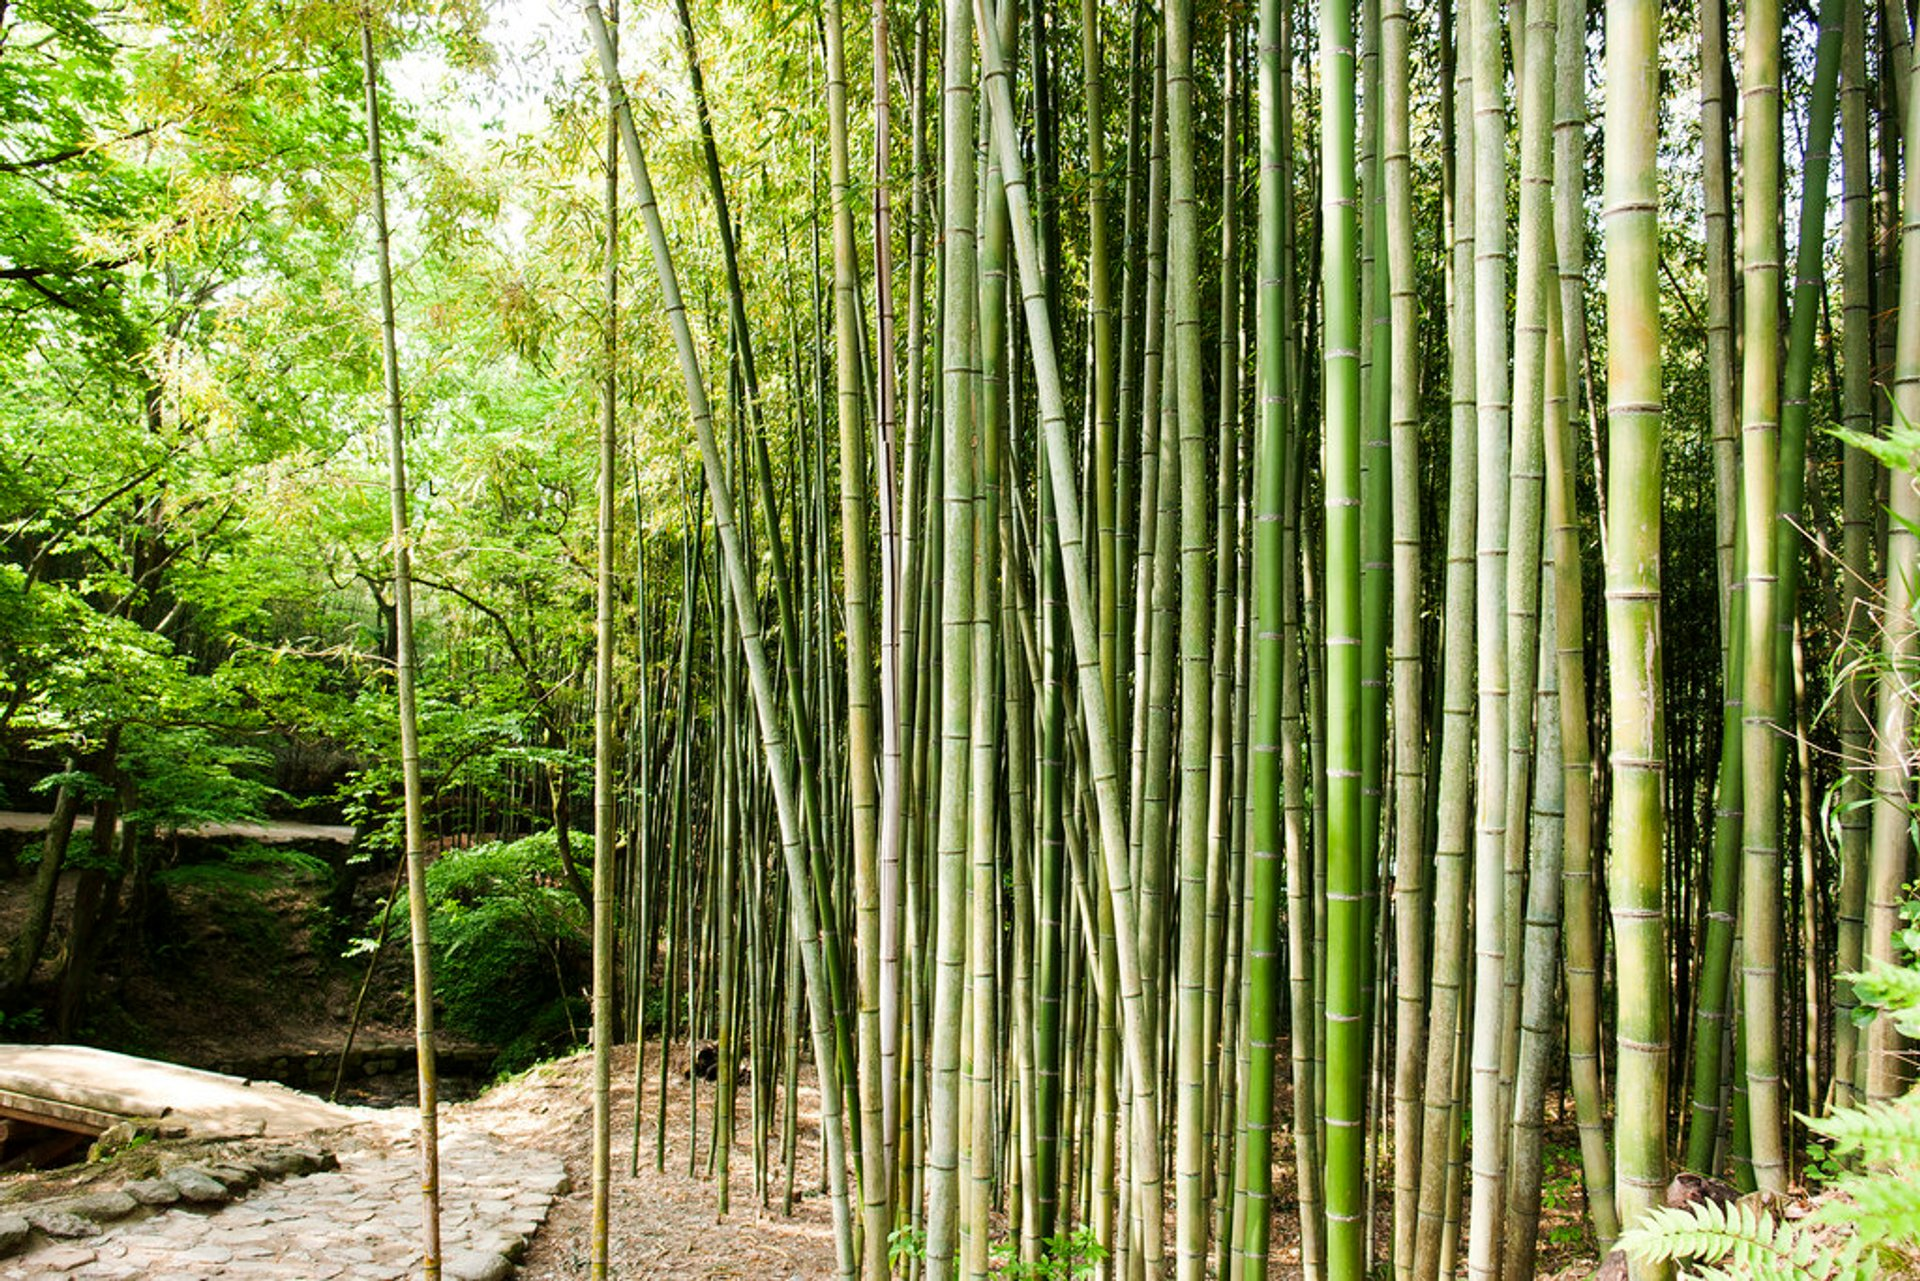 Bamboos of Damyang 2020